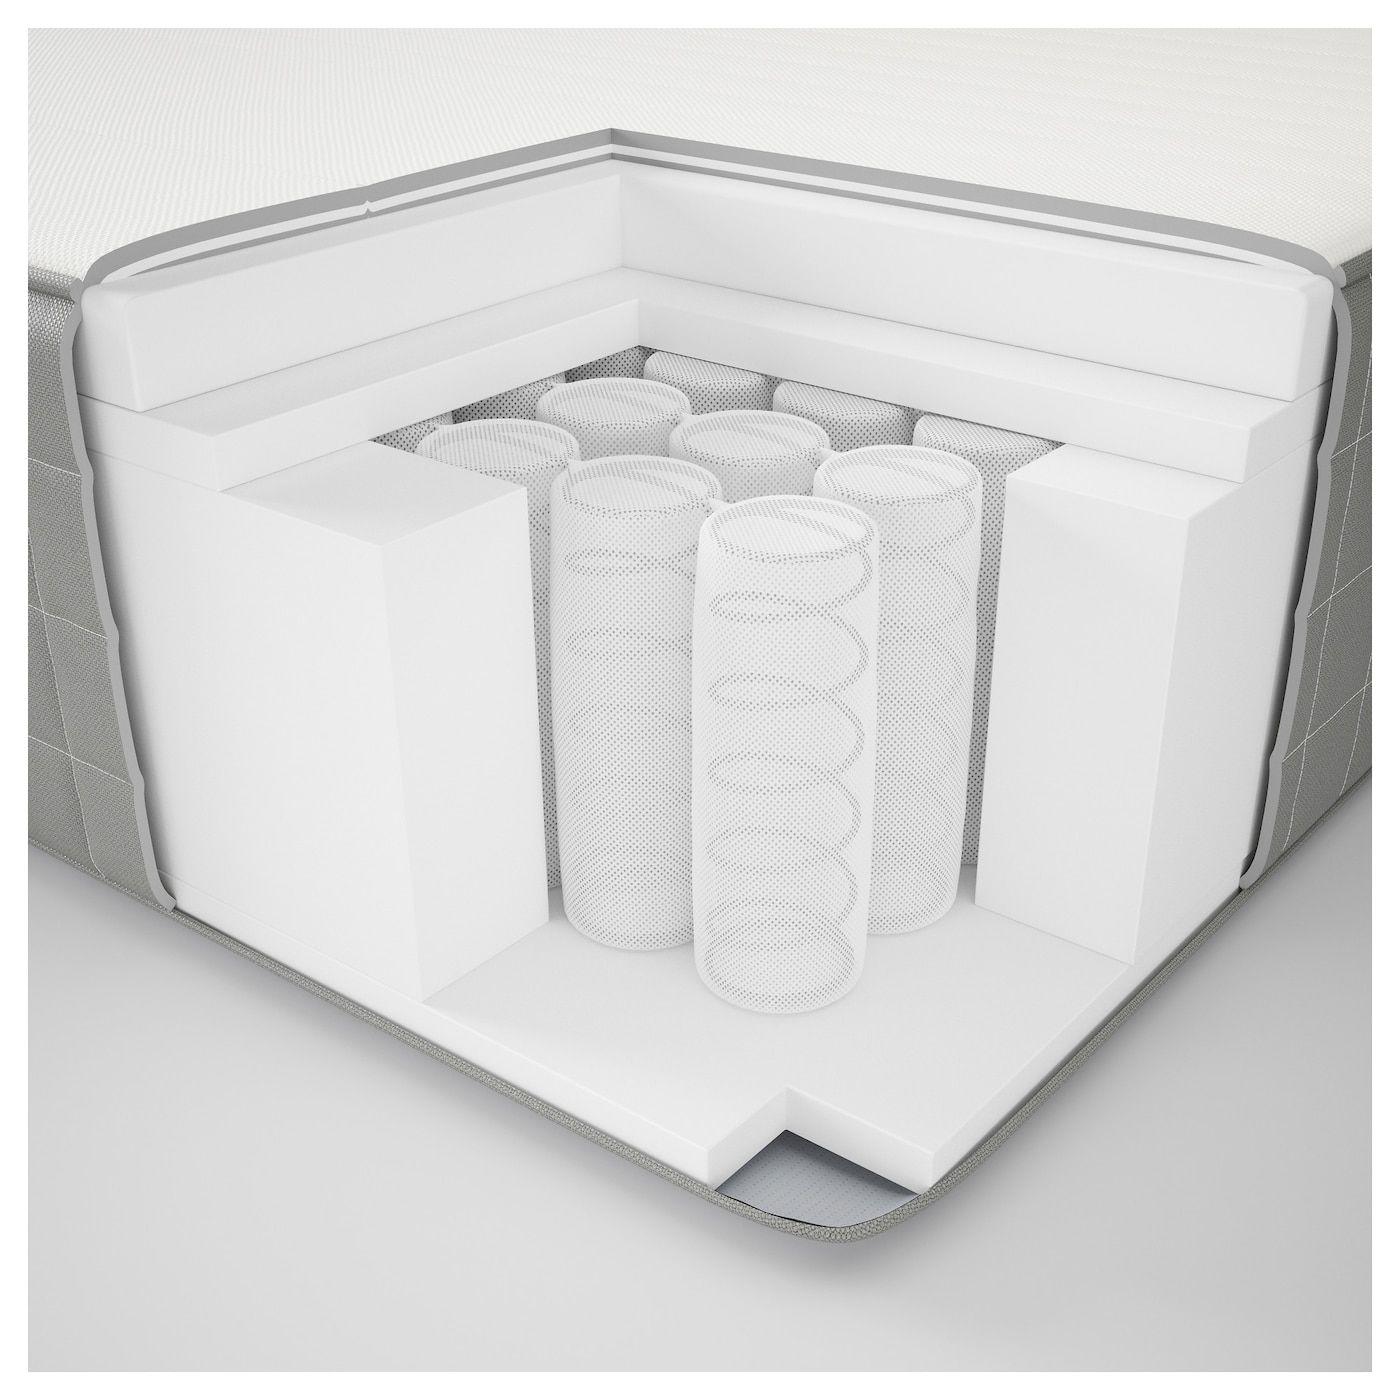 HAUGSVÄR Hybrid mattress firm, dark gray Queen Hybrid